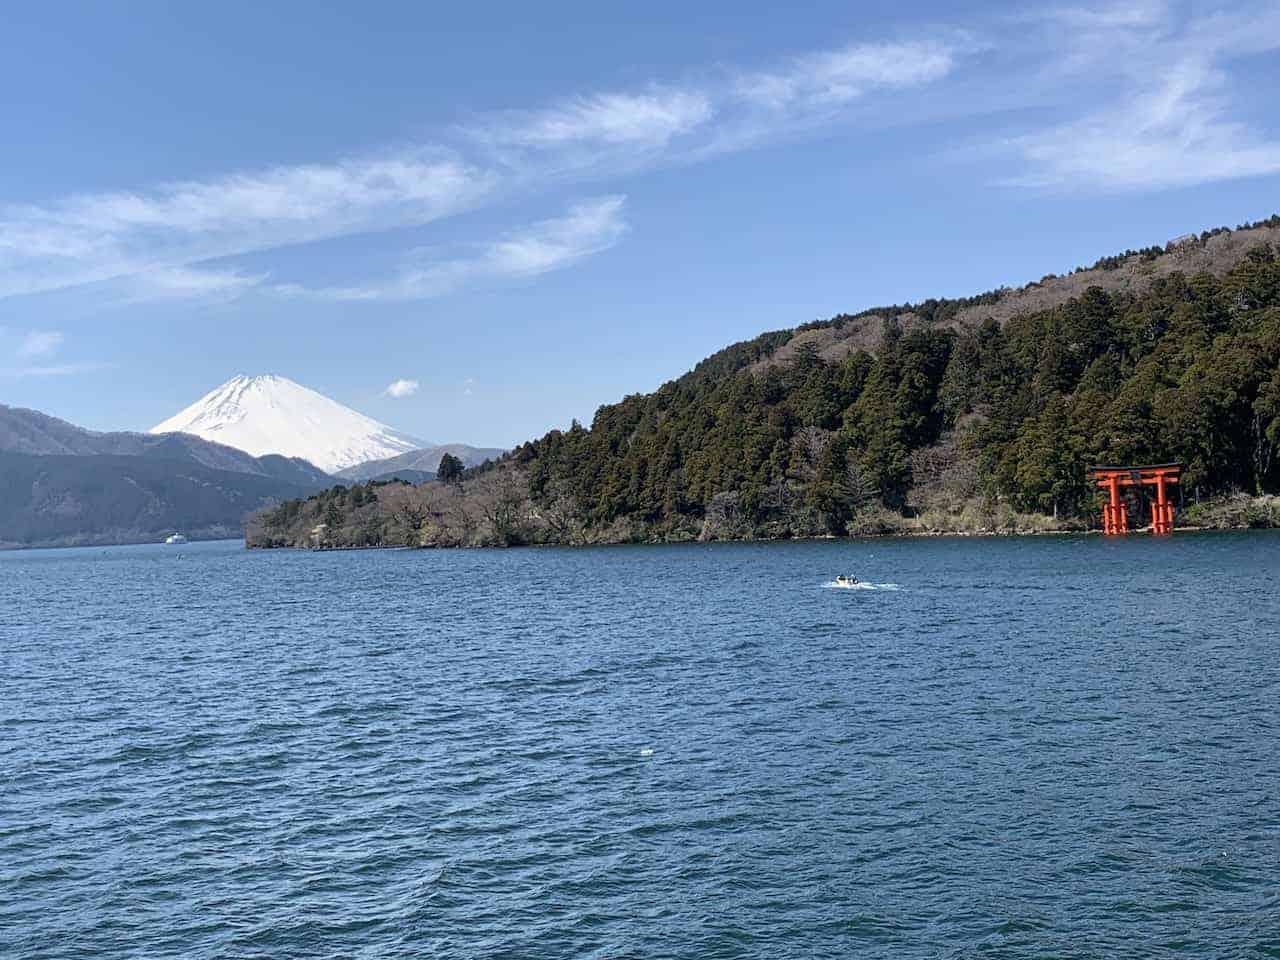 Mount Fuji Hakone Shrine View